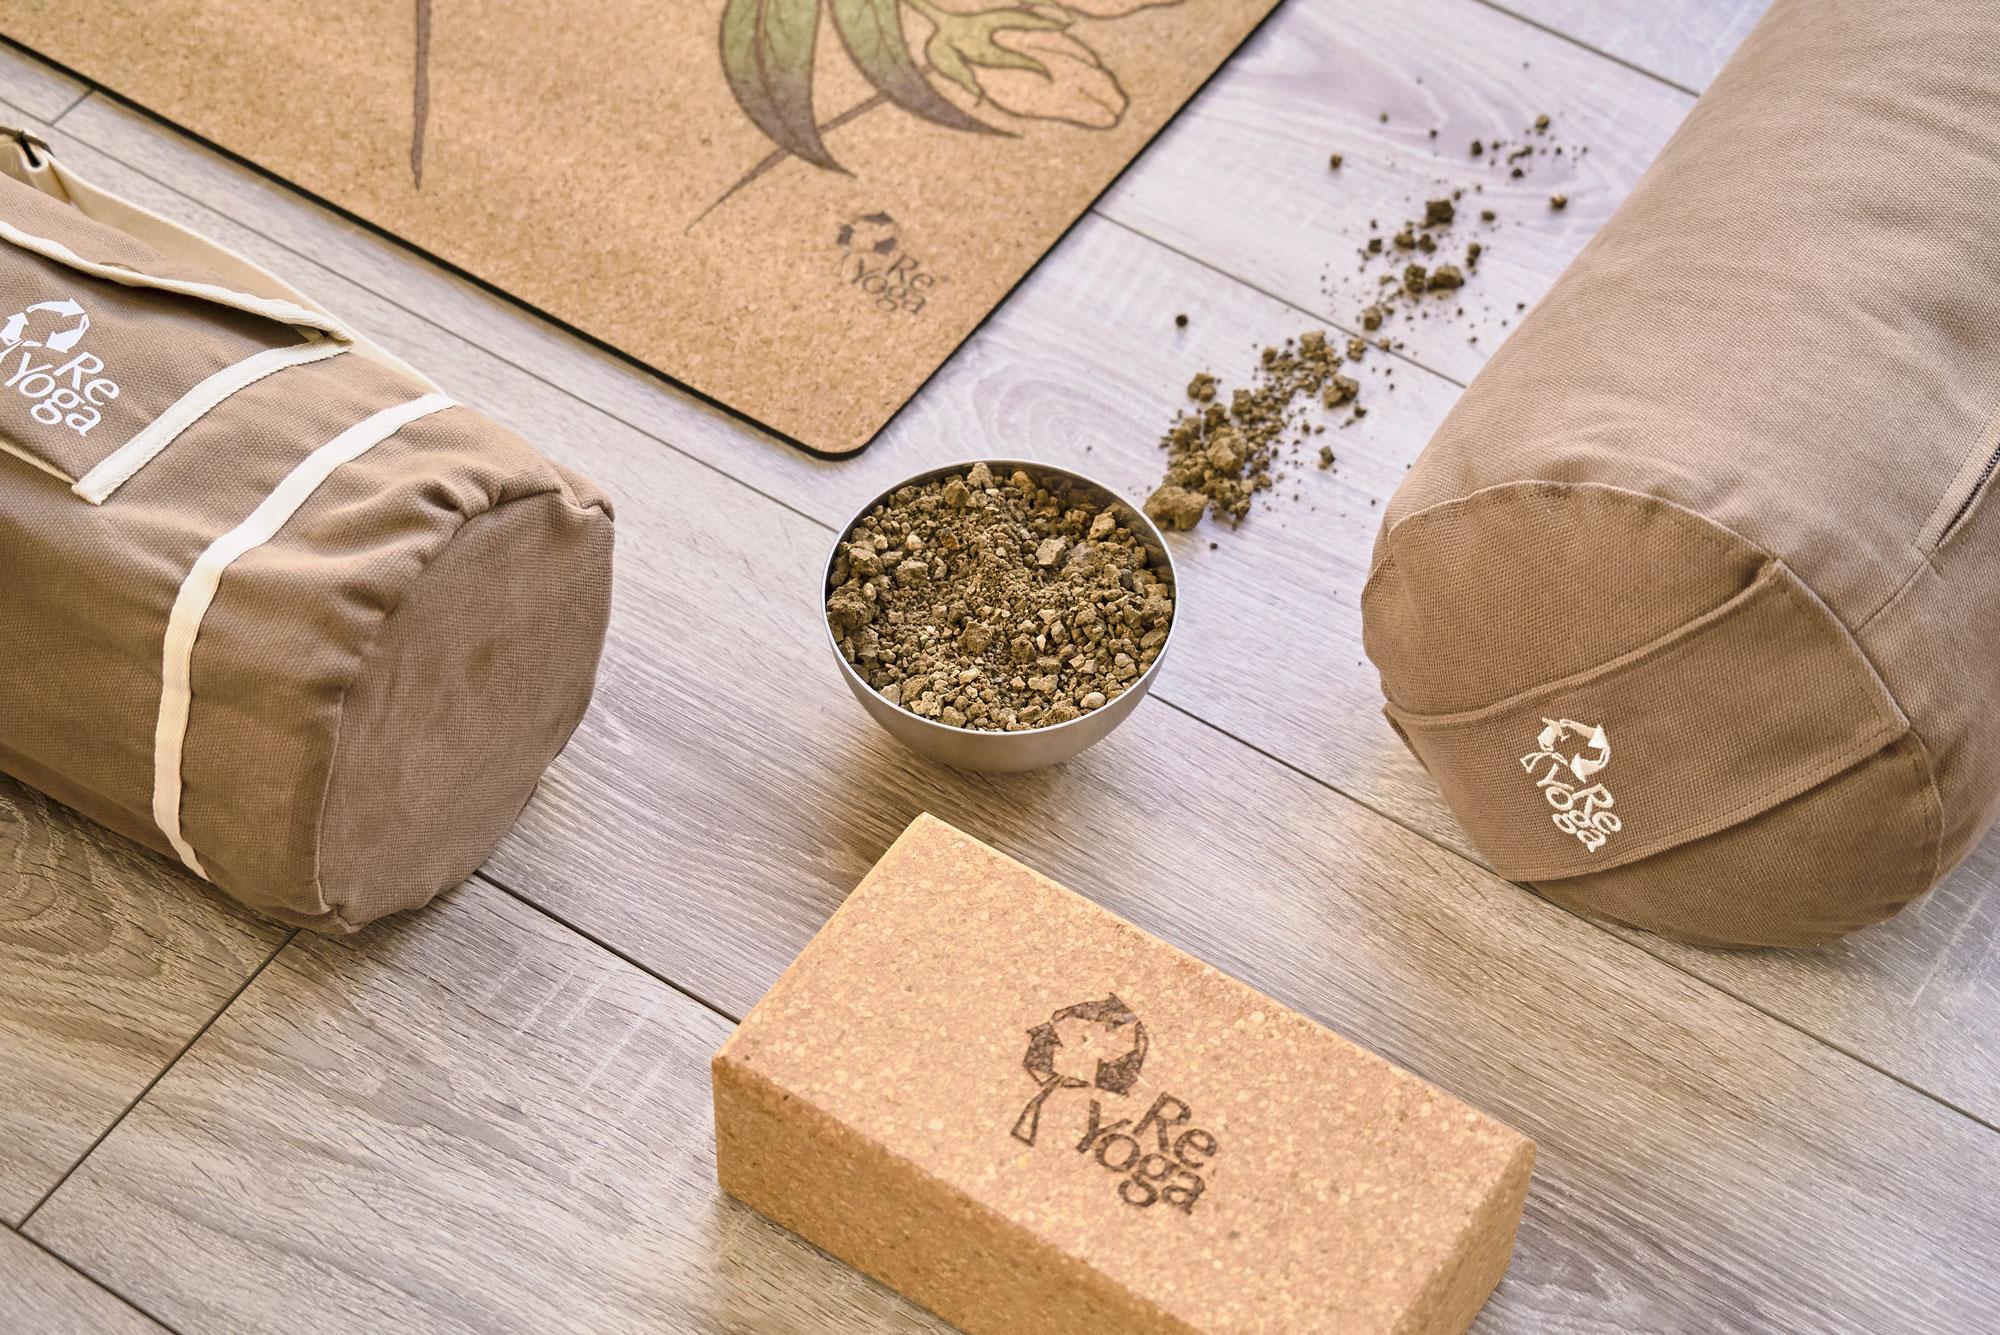 reyoga nuove colorazioni 2019 cuscini yoga borse porta tappetino tappetini